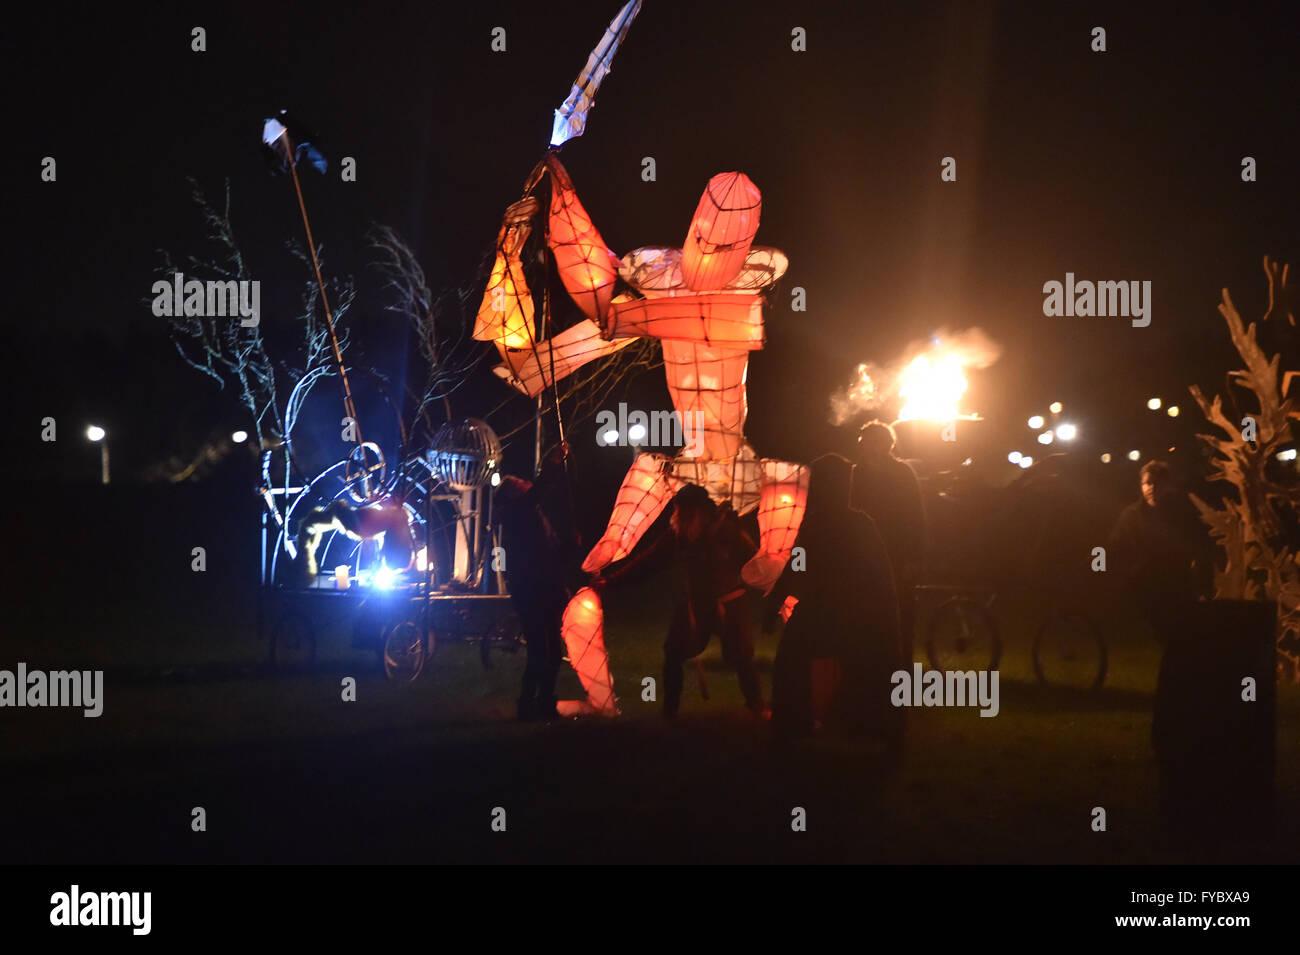 Fire Festival  Campbell Park Milton Keynes  Paraffinalia  Orange soldier marchs and attacks - Stock Image